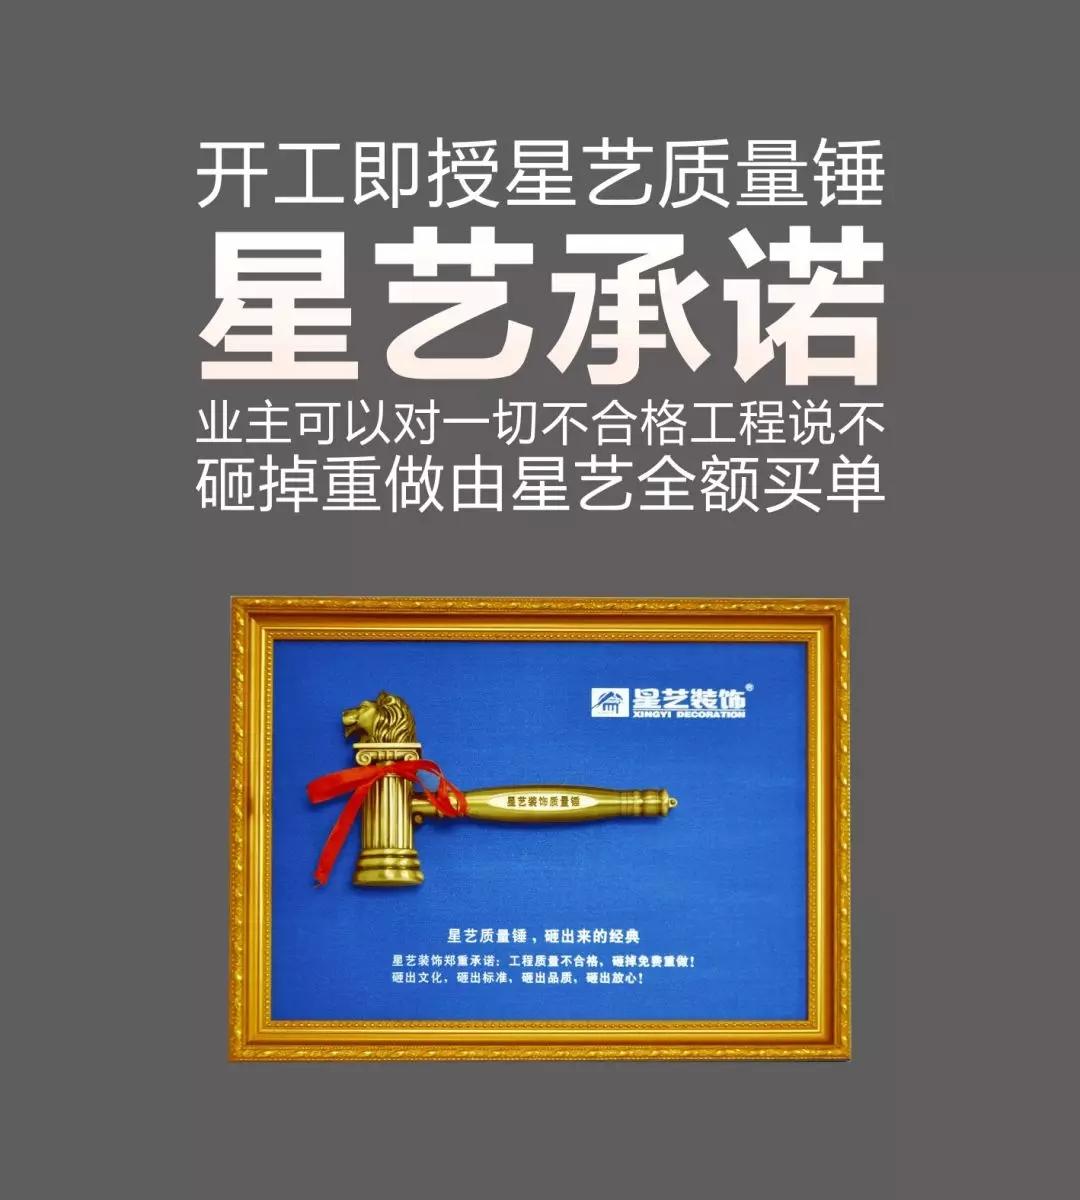 http://xystcdn.xydec.com.cn/uploadfiles/image/20181027/cdb7874c8eb543fddfa42a9c5aa8c758.jpg